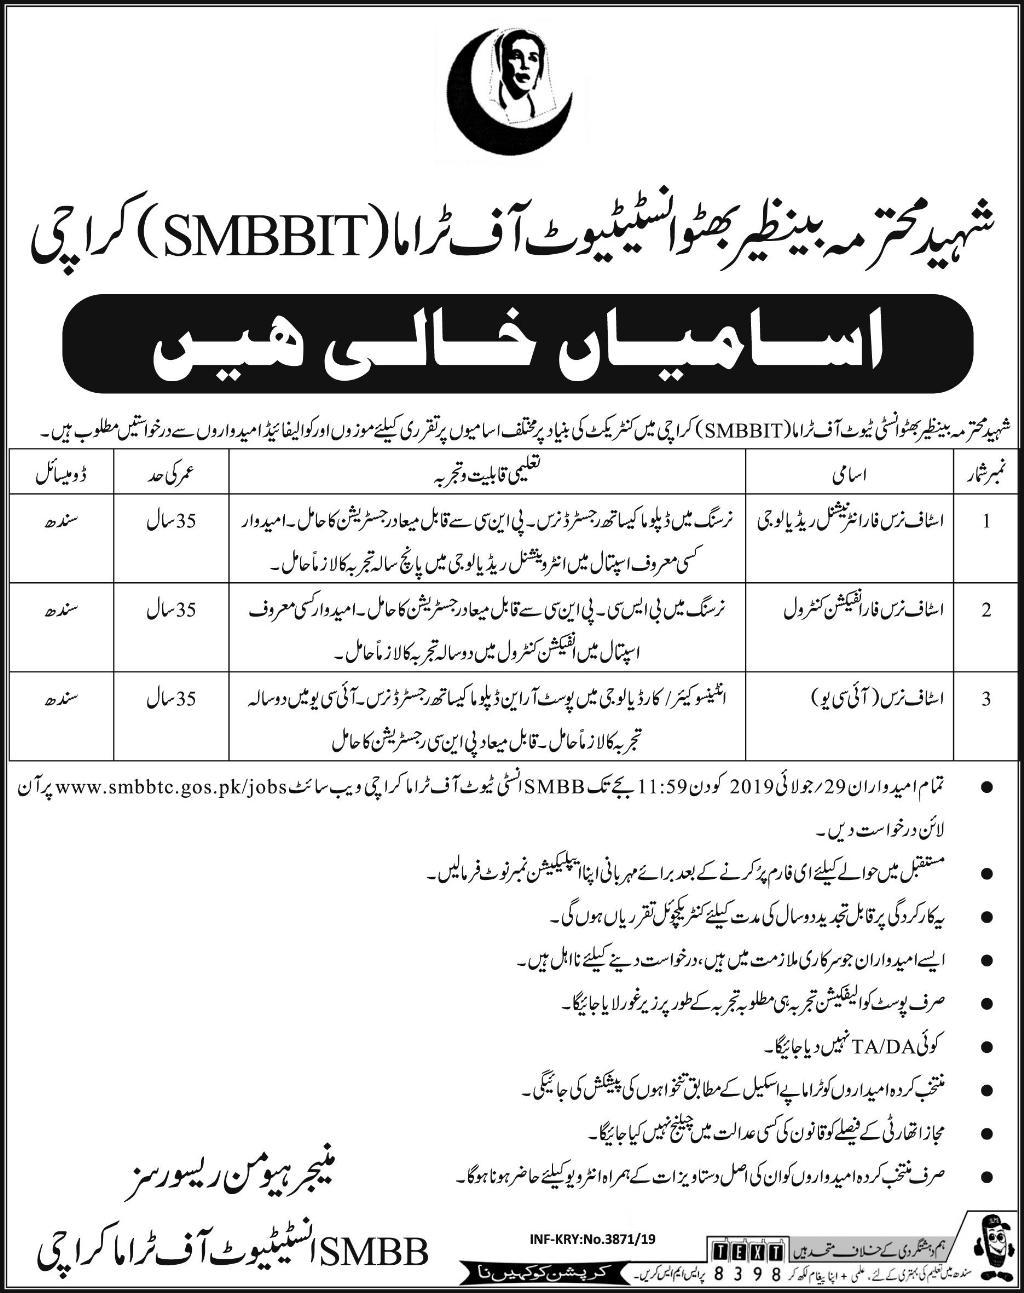 SMBBIT Karachi Jobs 2019 for Staff Nurses on 14 July, 2019